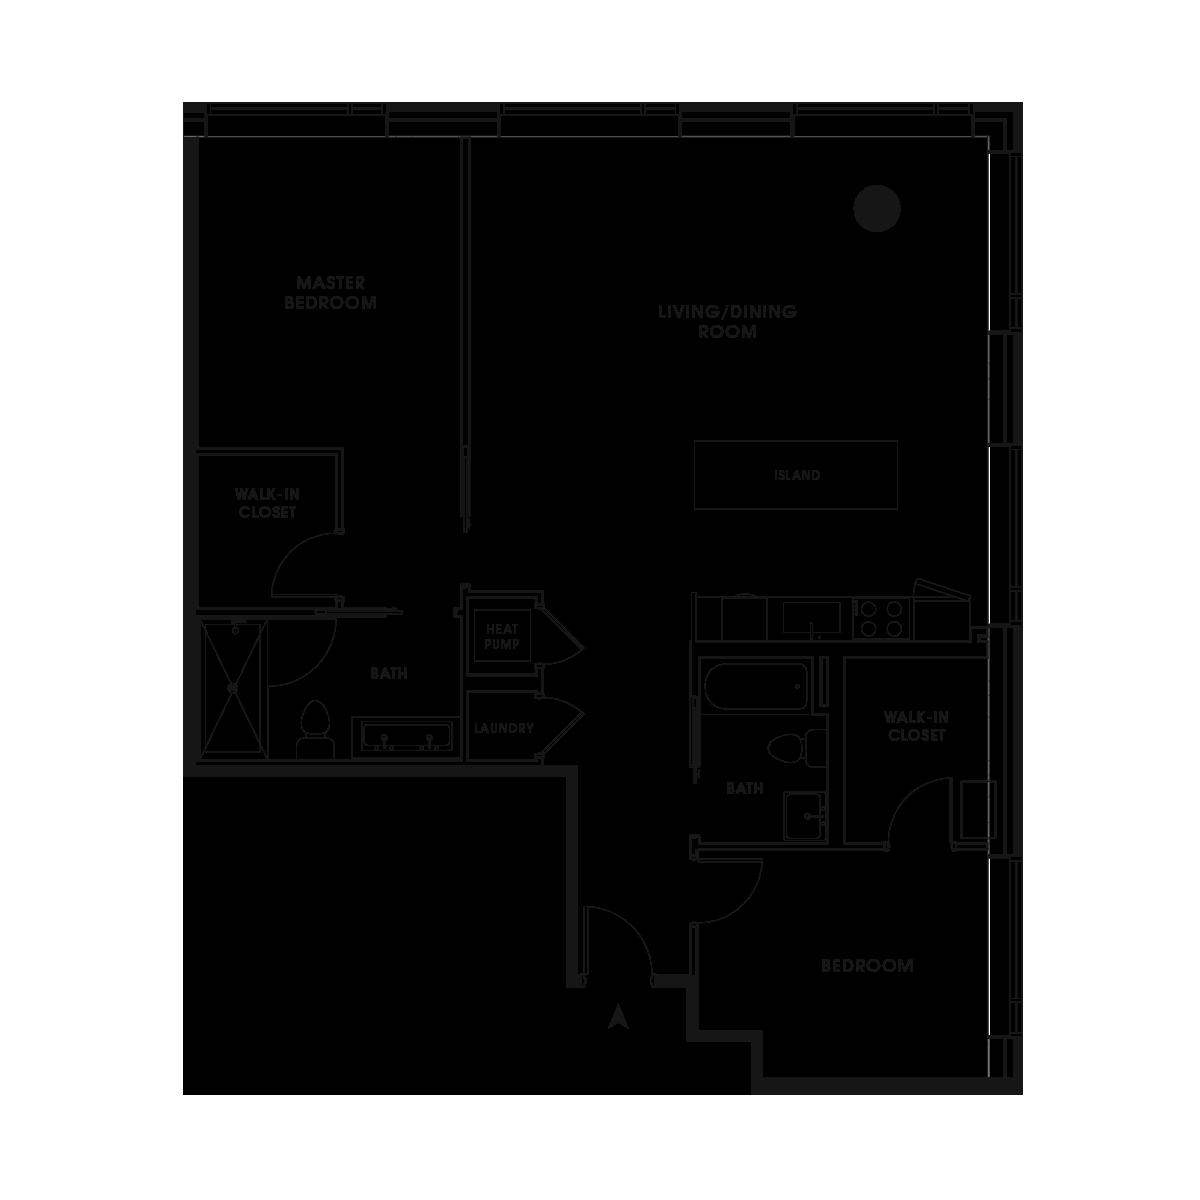 Grayson manor floor plan best free home design idea for 100 floors 3rd floor